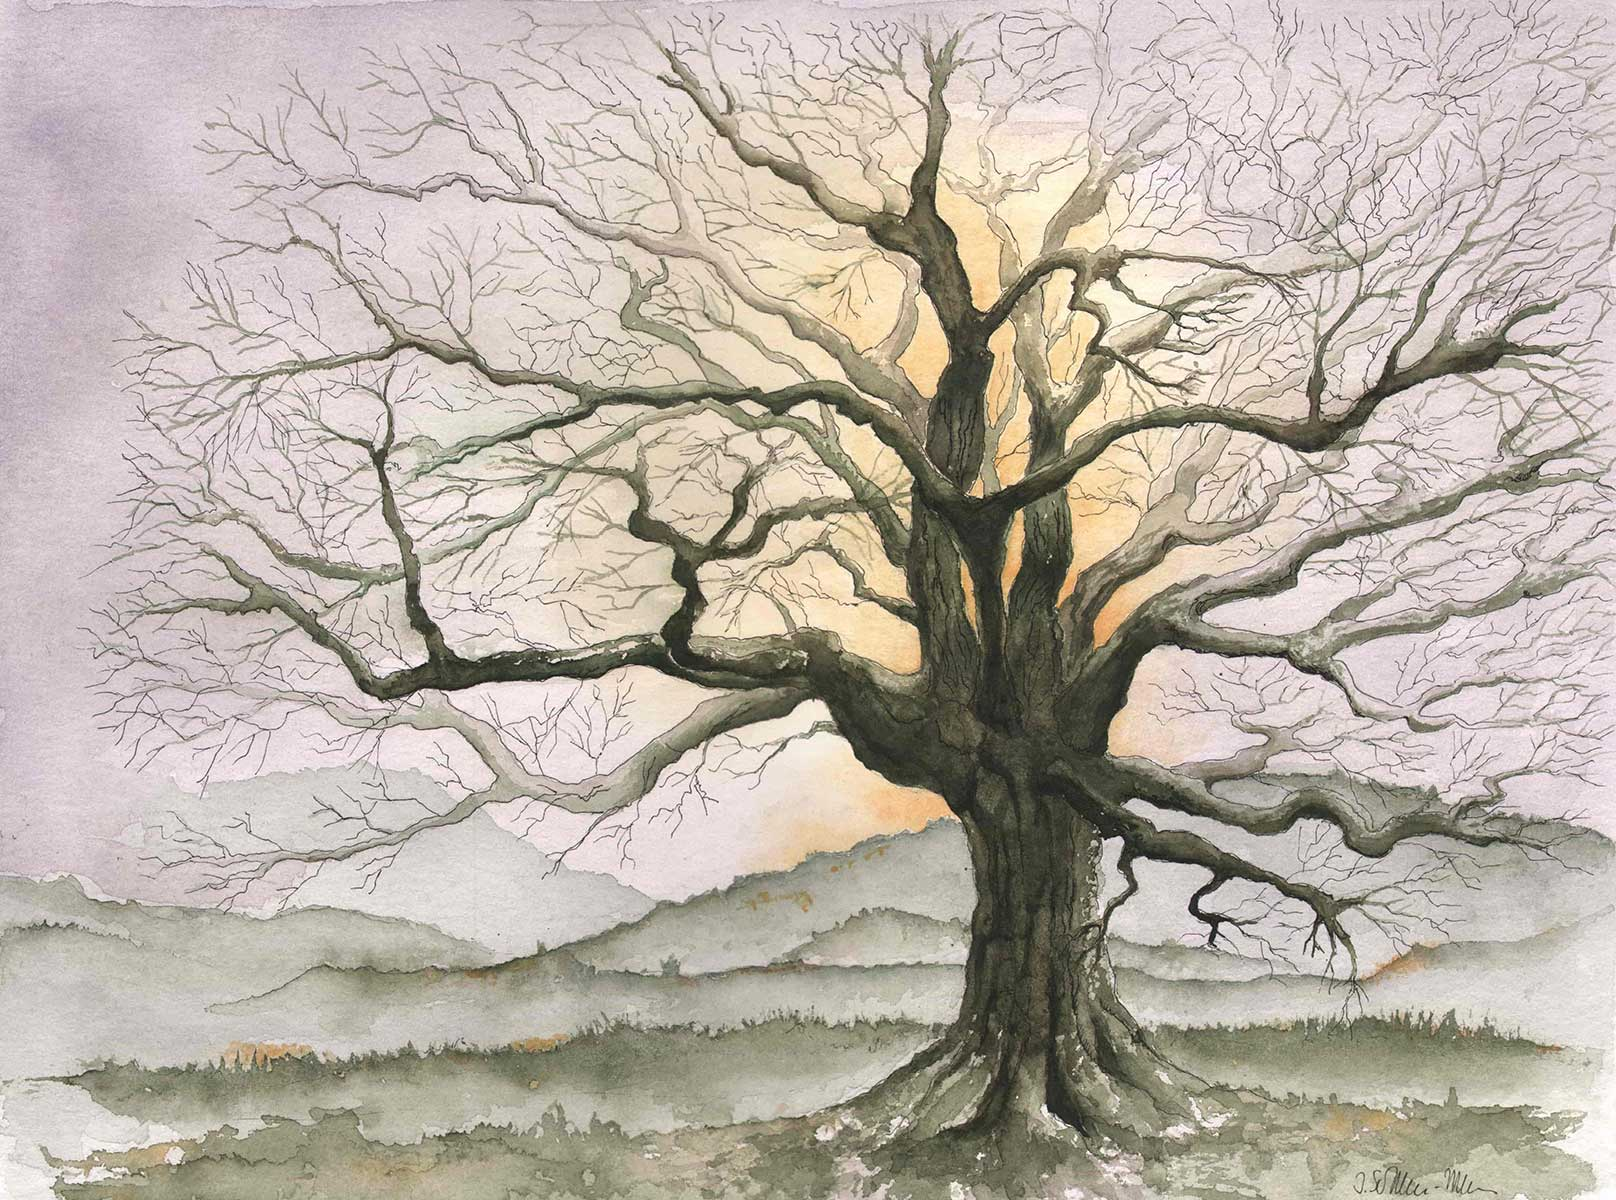 Kahler Baum im Gegenlicht, Aquarell